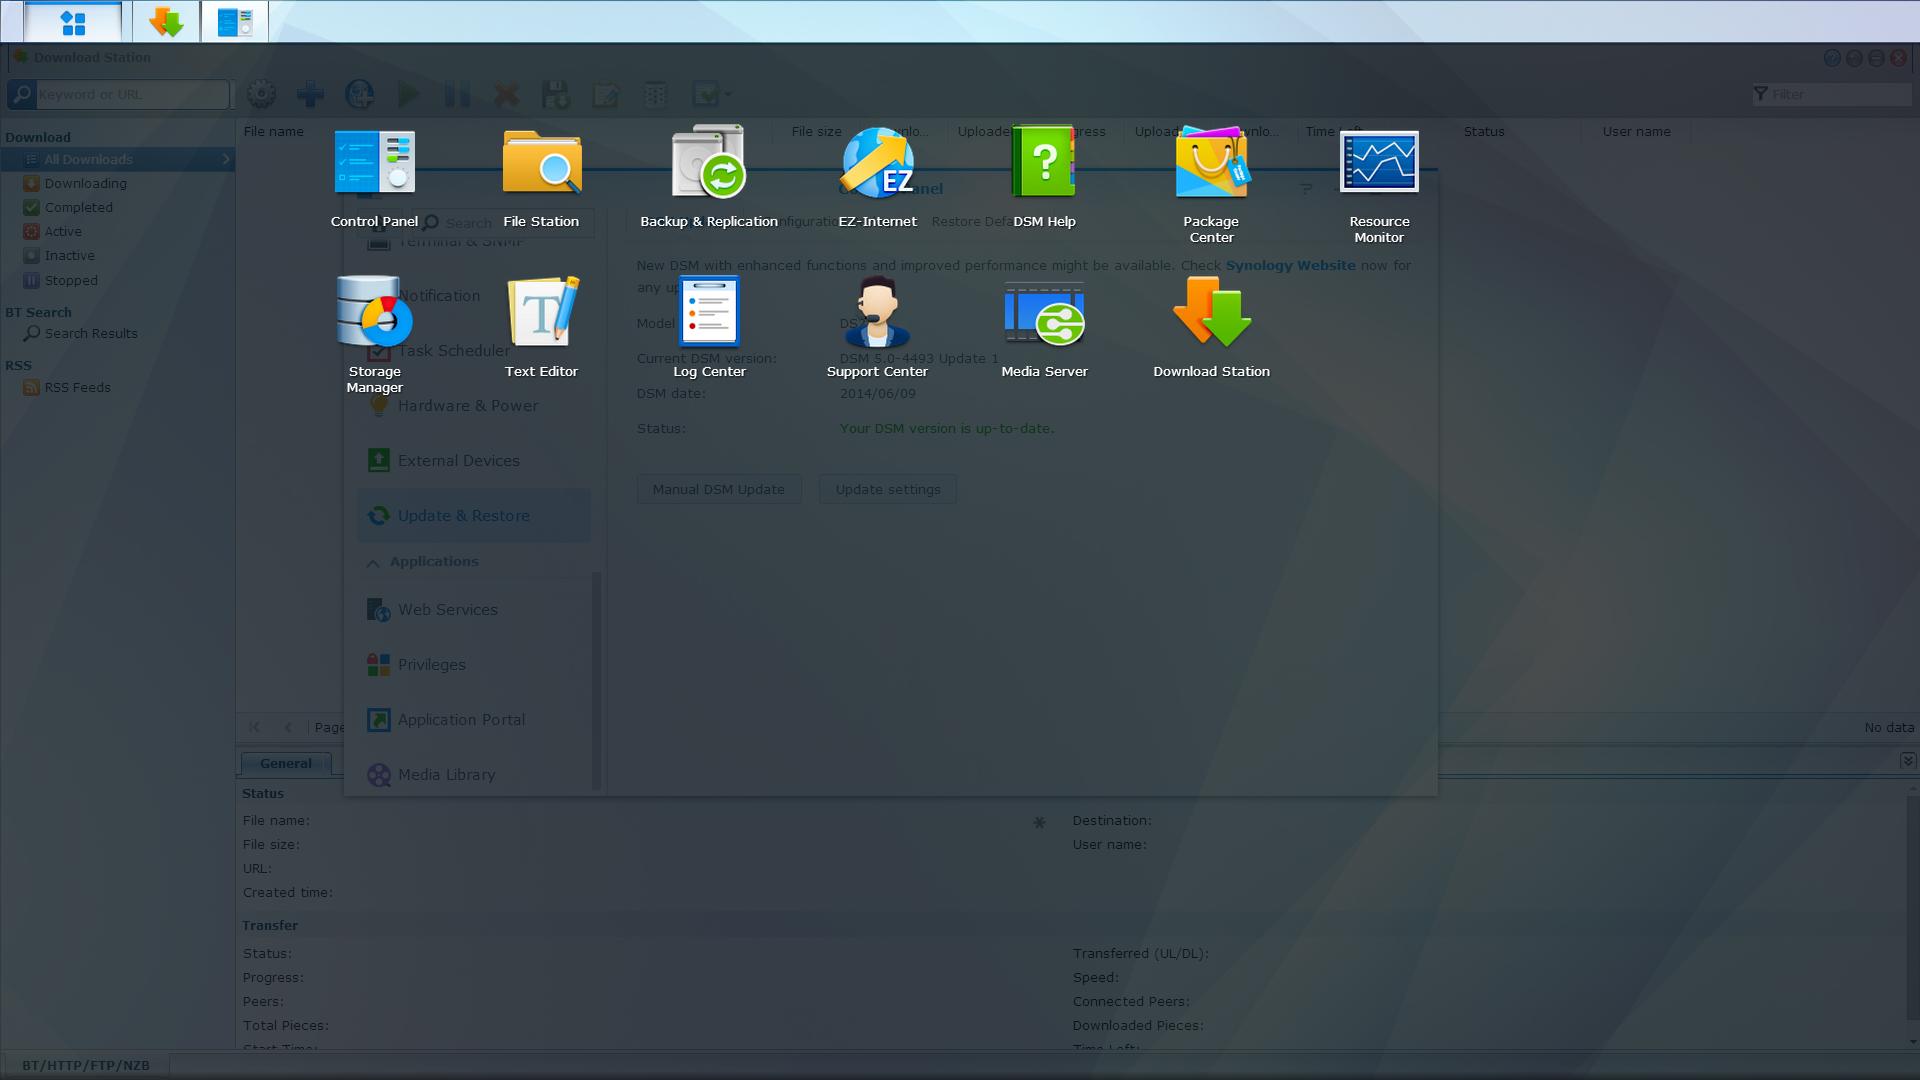 DownloadStation Tutorial 2